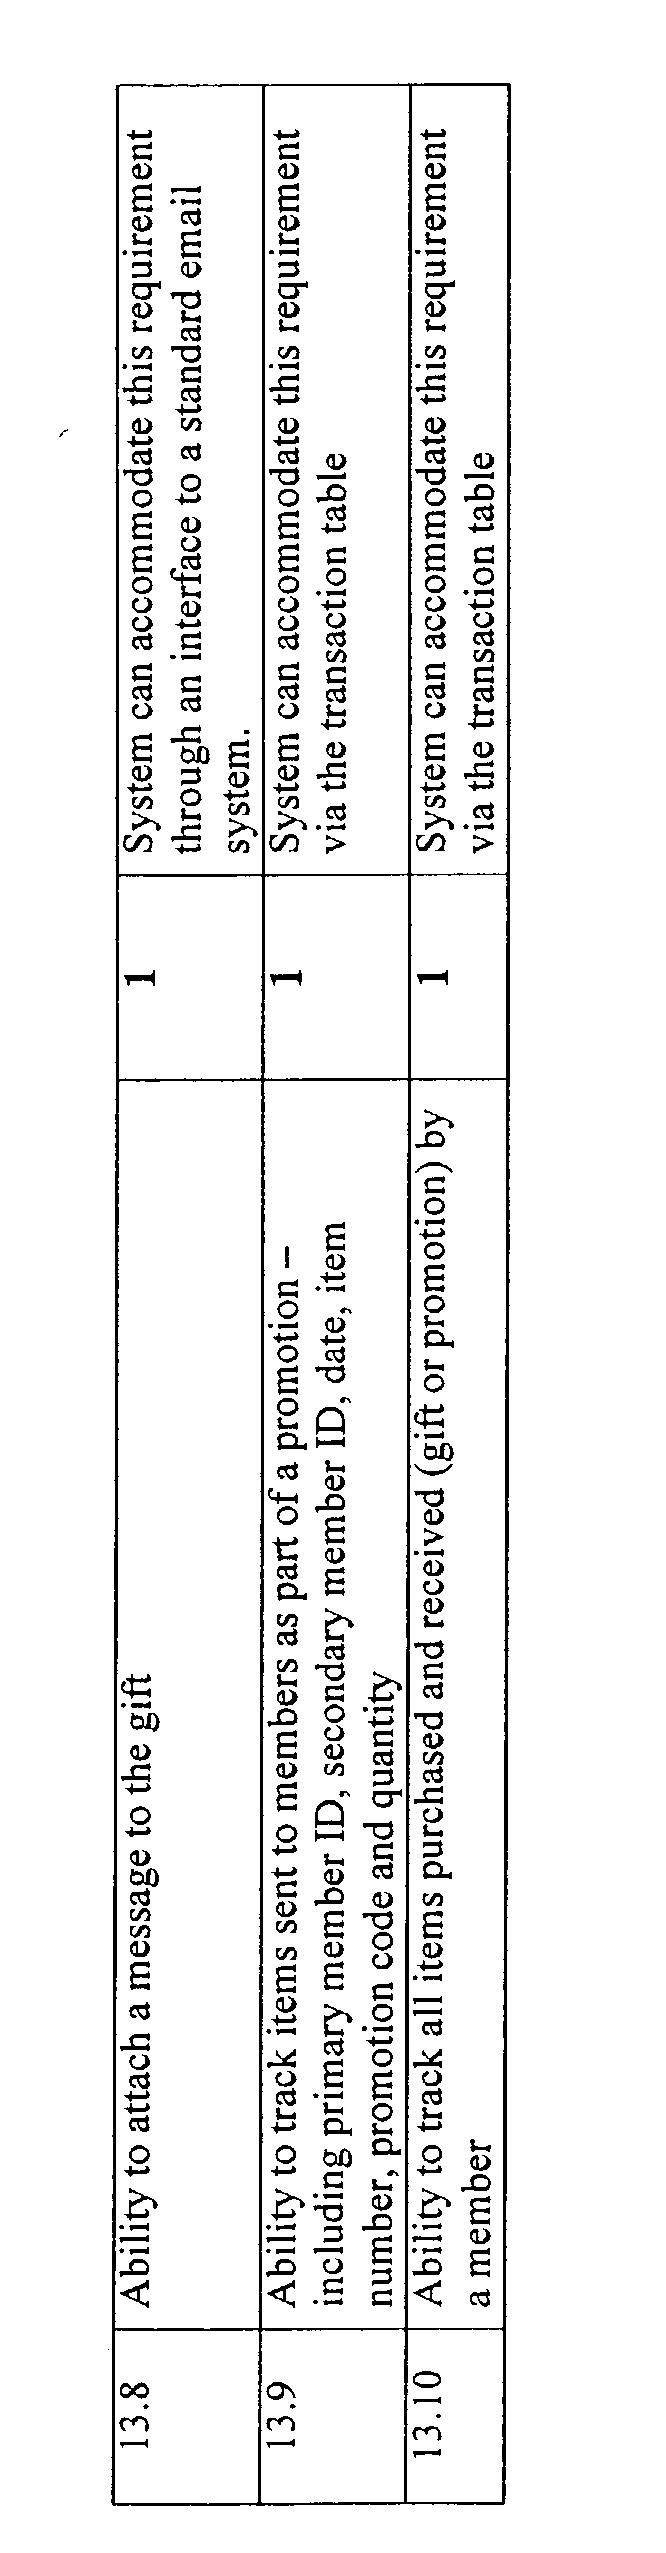 Figure US20030023491A1-20030130-P00062